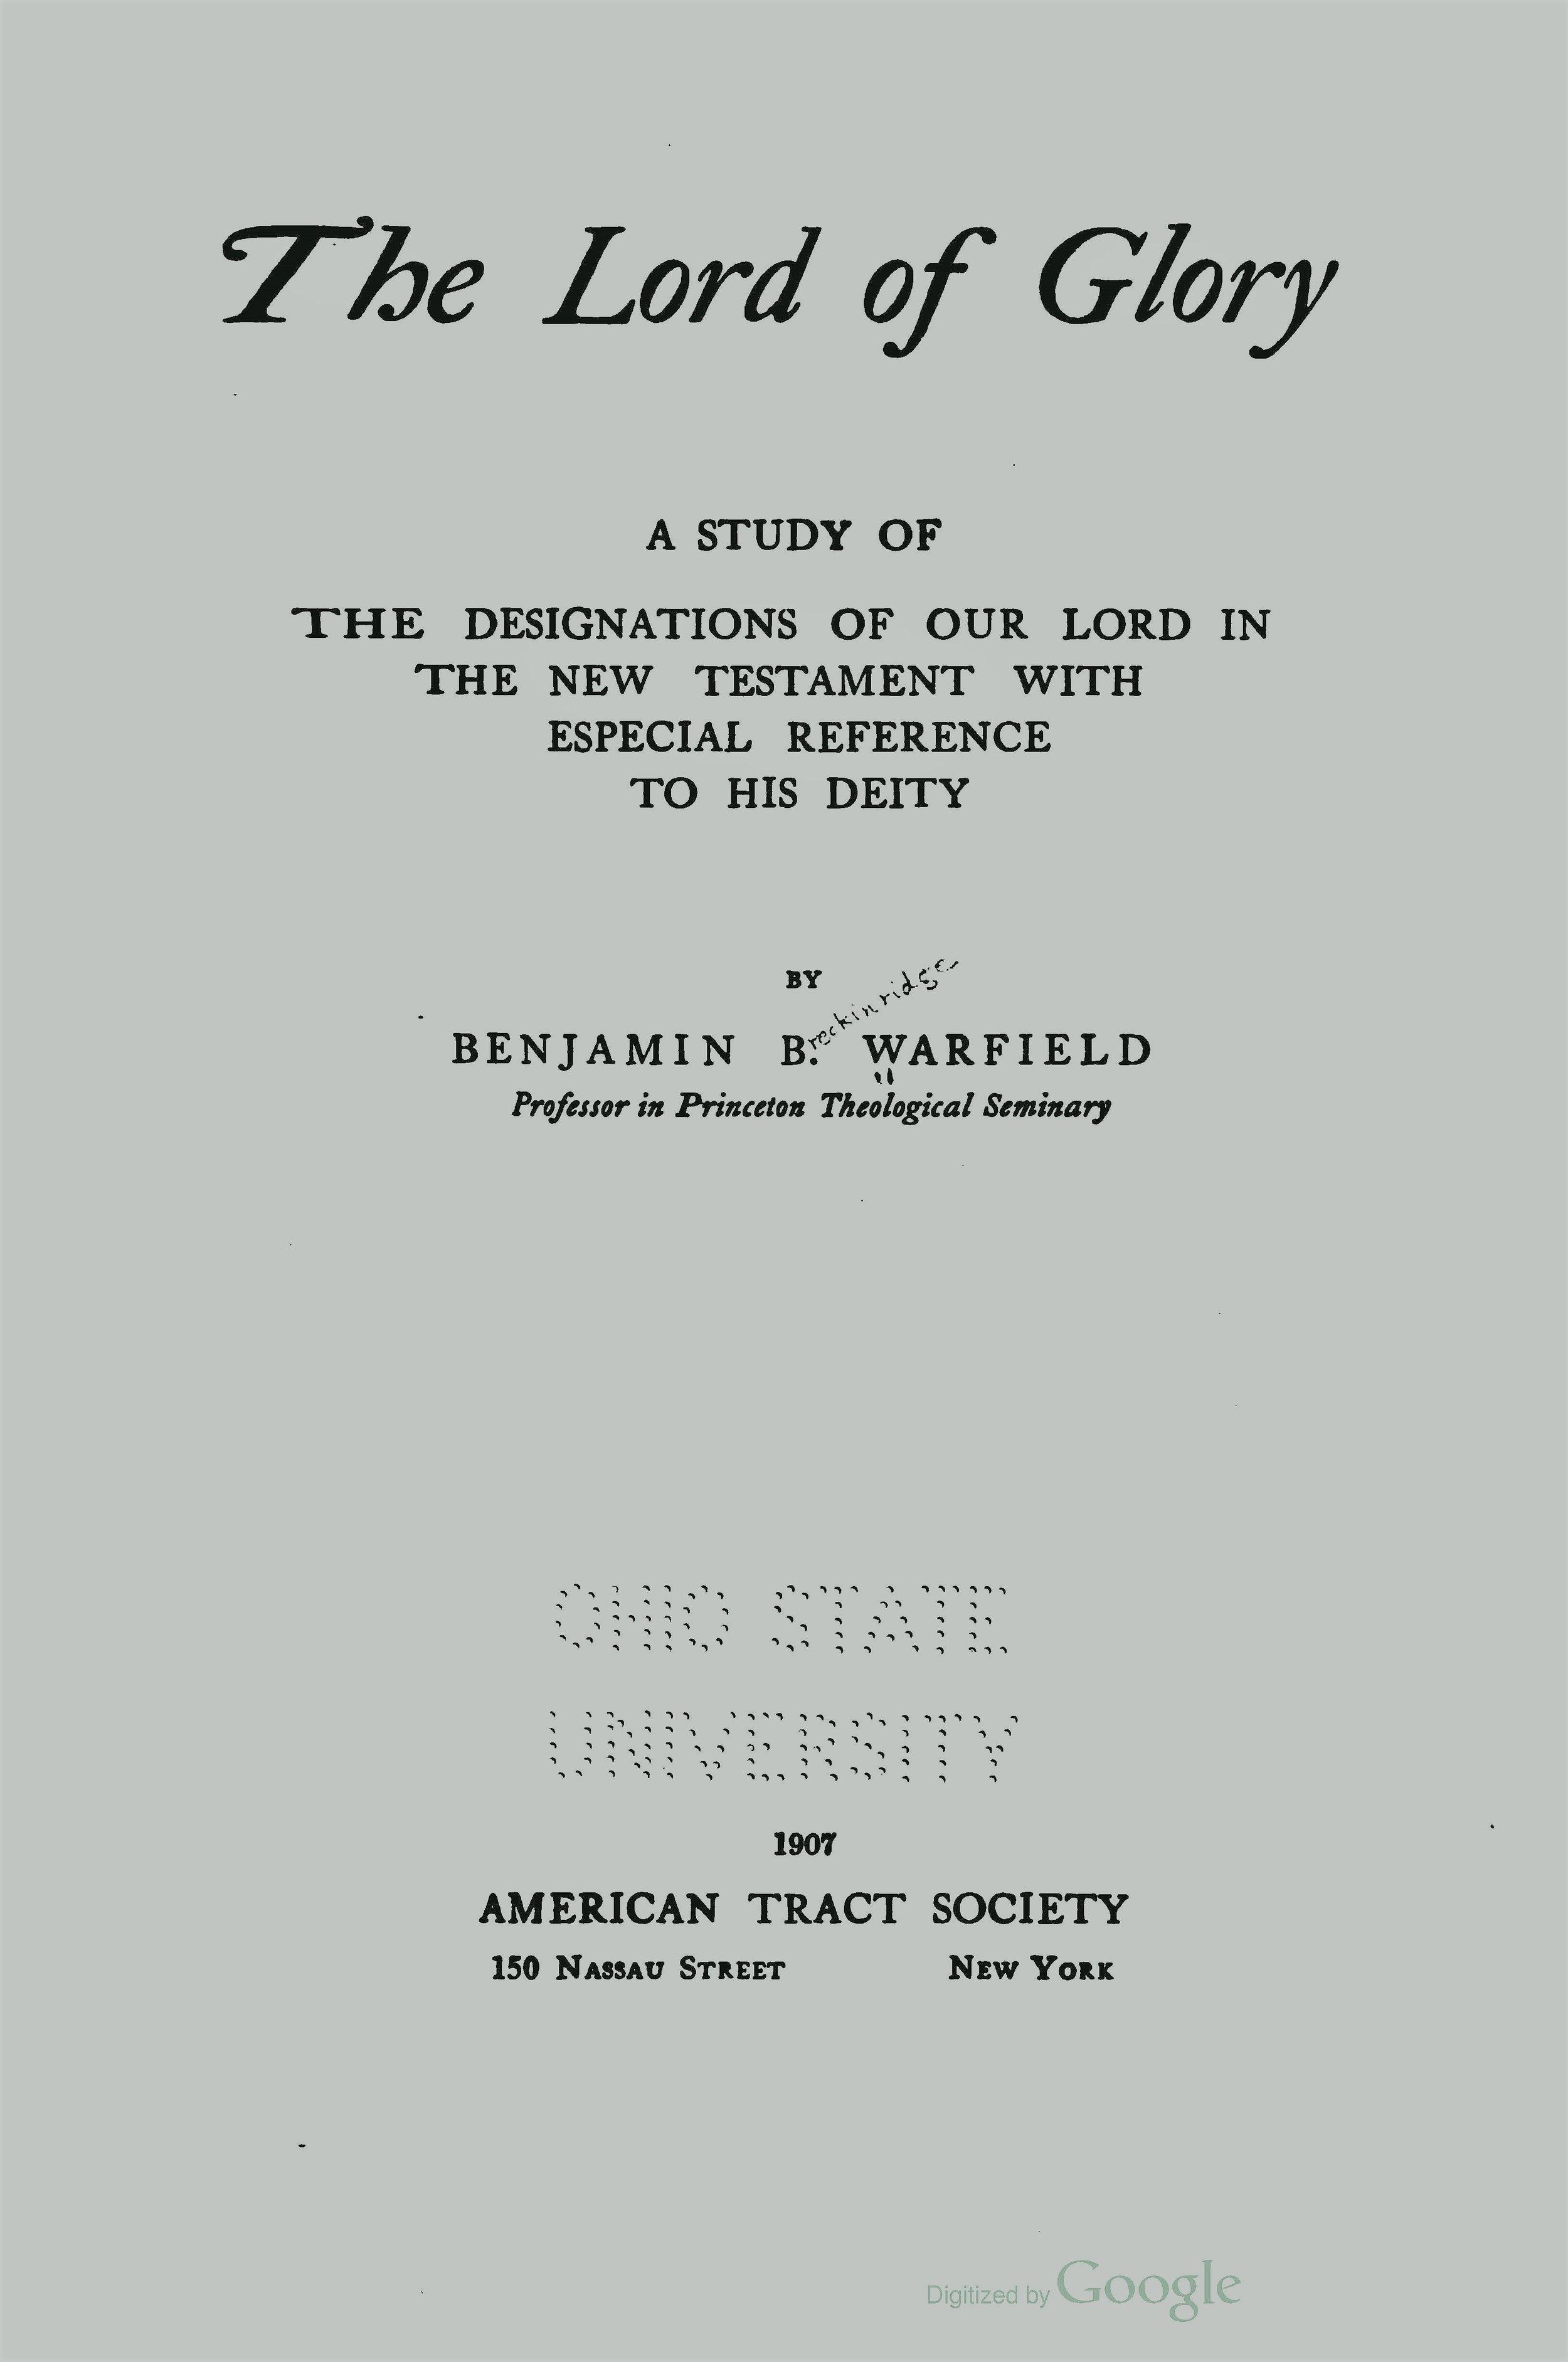 Warfield, Benjamin Breckinridge, The Lord of Glory Title Page.jpg